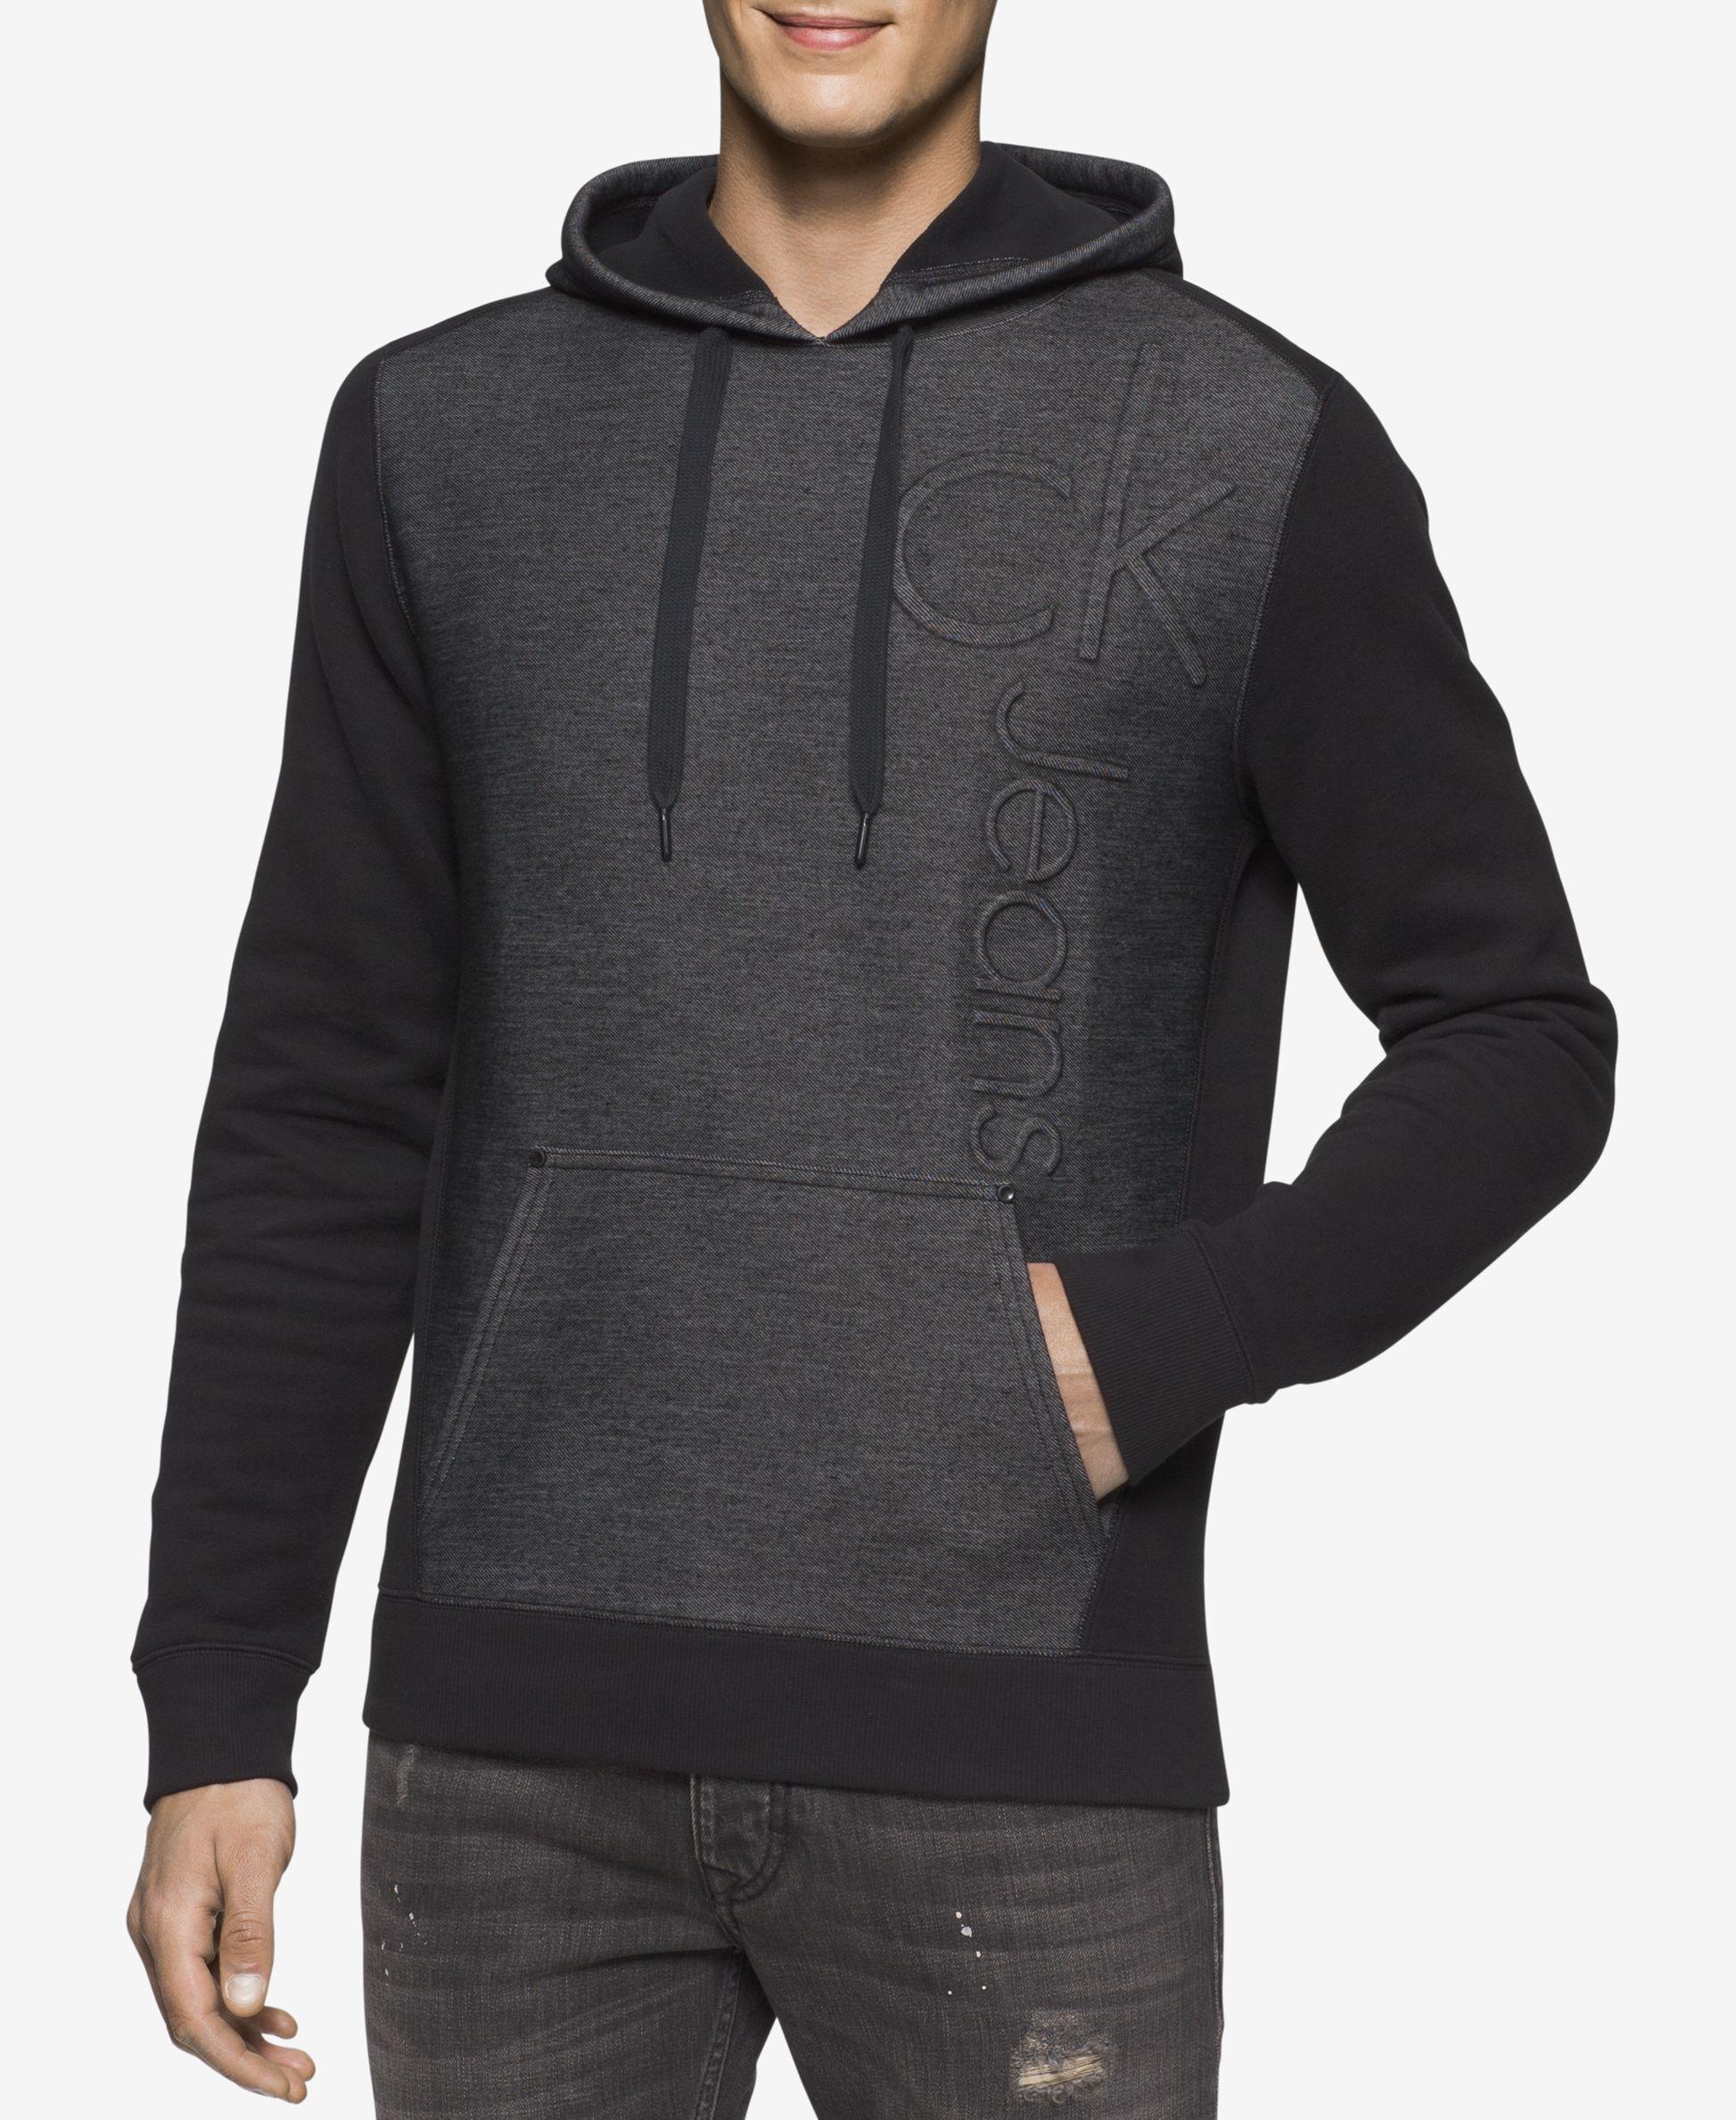 calvin klein jeans men 39 s colorblocked embossed logo hoodie in black for men lyst. Black Bedroom Furniture Sets. Home Design Ideas